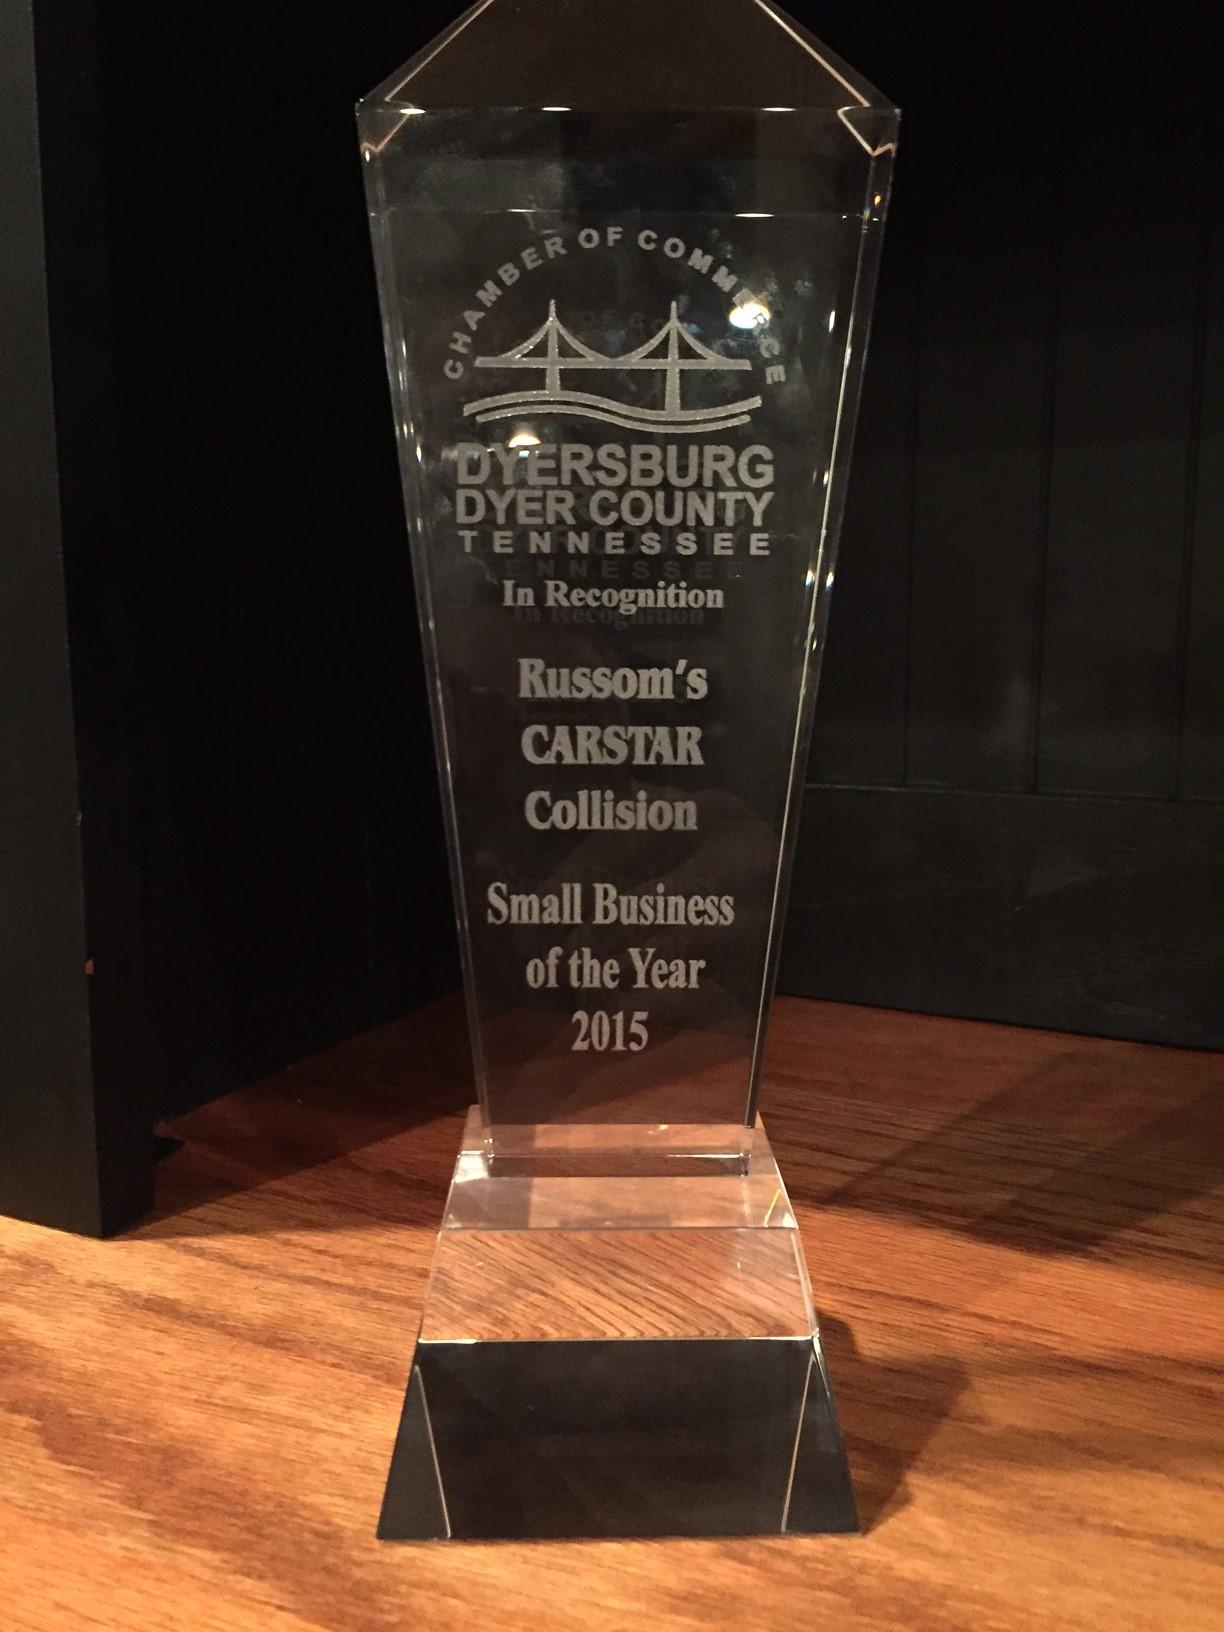 Carstar | Russom's CARSTAR: Small Business of the Year Award